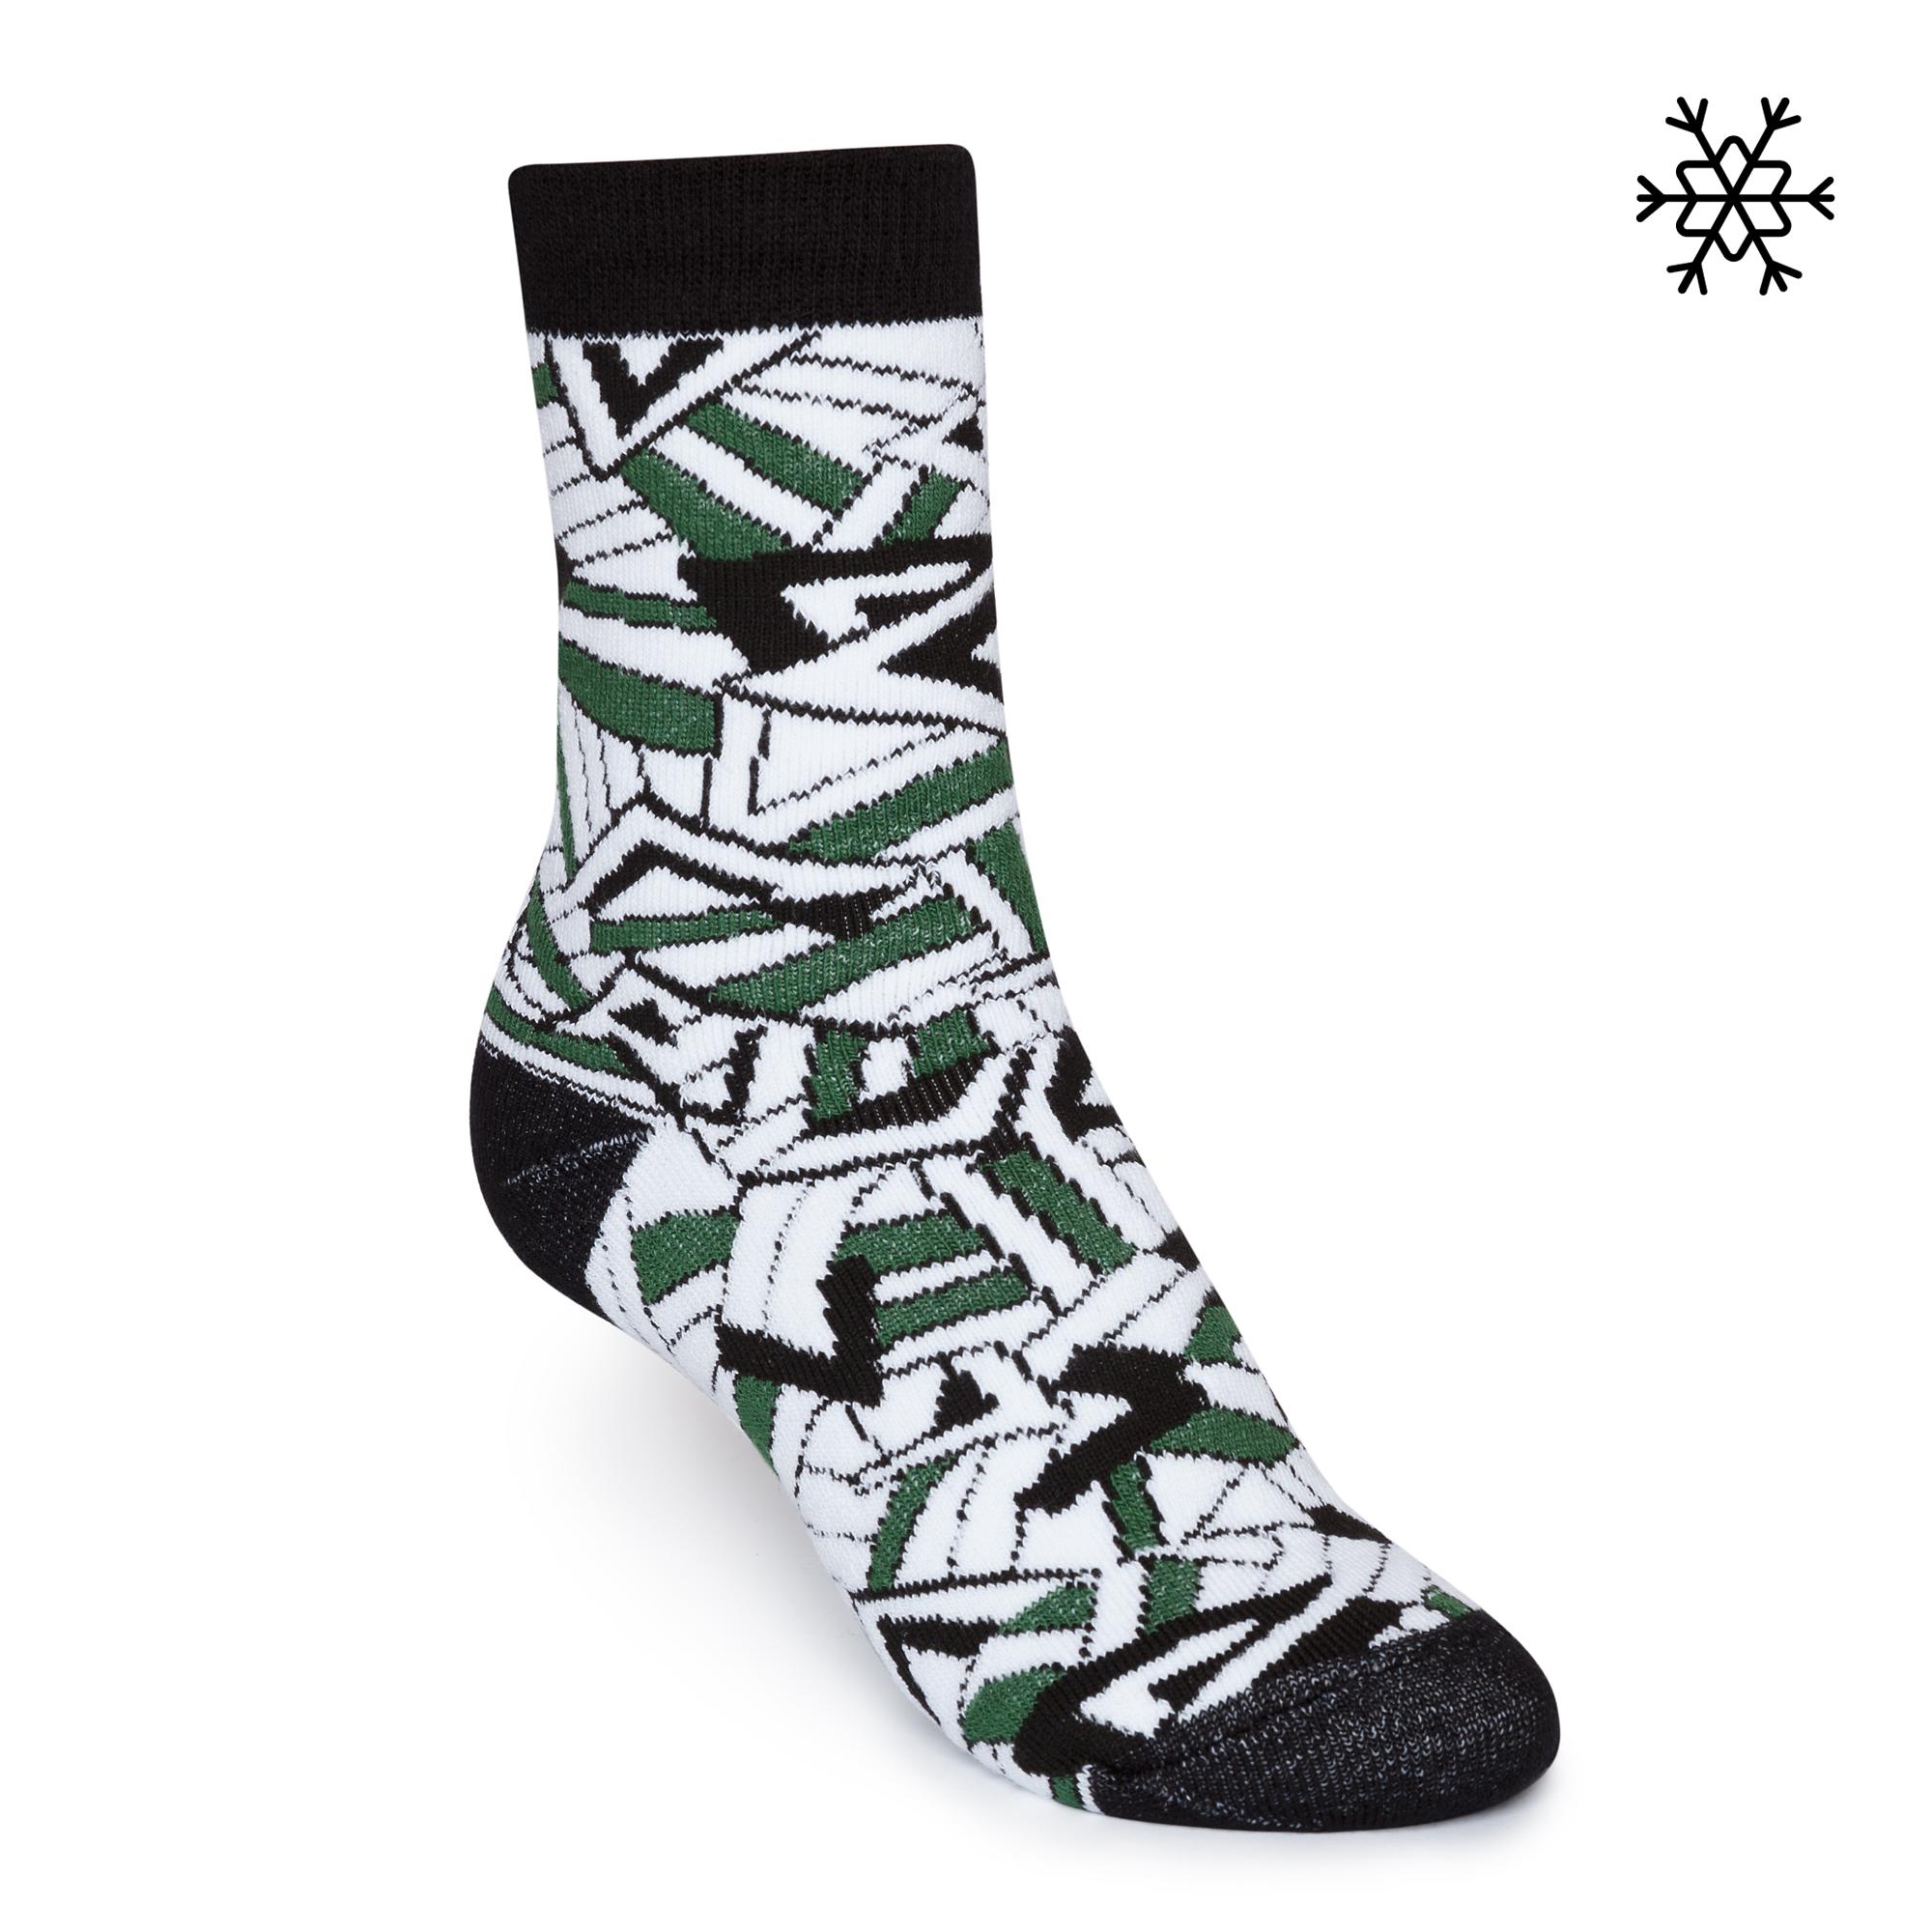 Crystal High-Top Plüsch Socken green/white/black Bio & Fair